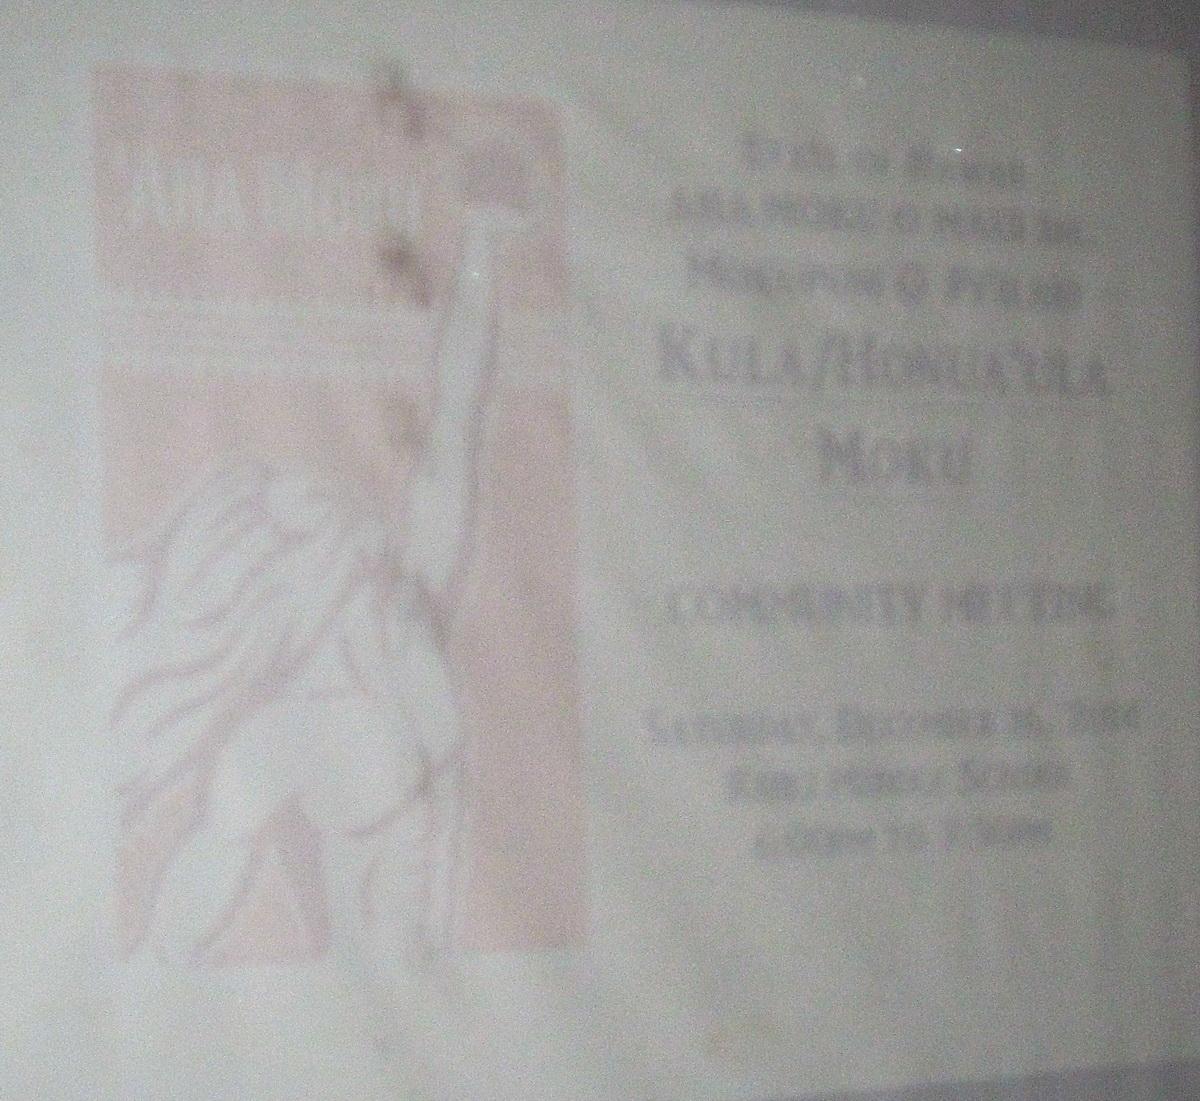 First Kula Aha Moku Meeting in Kihei on Tuesday